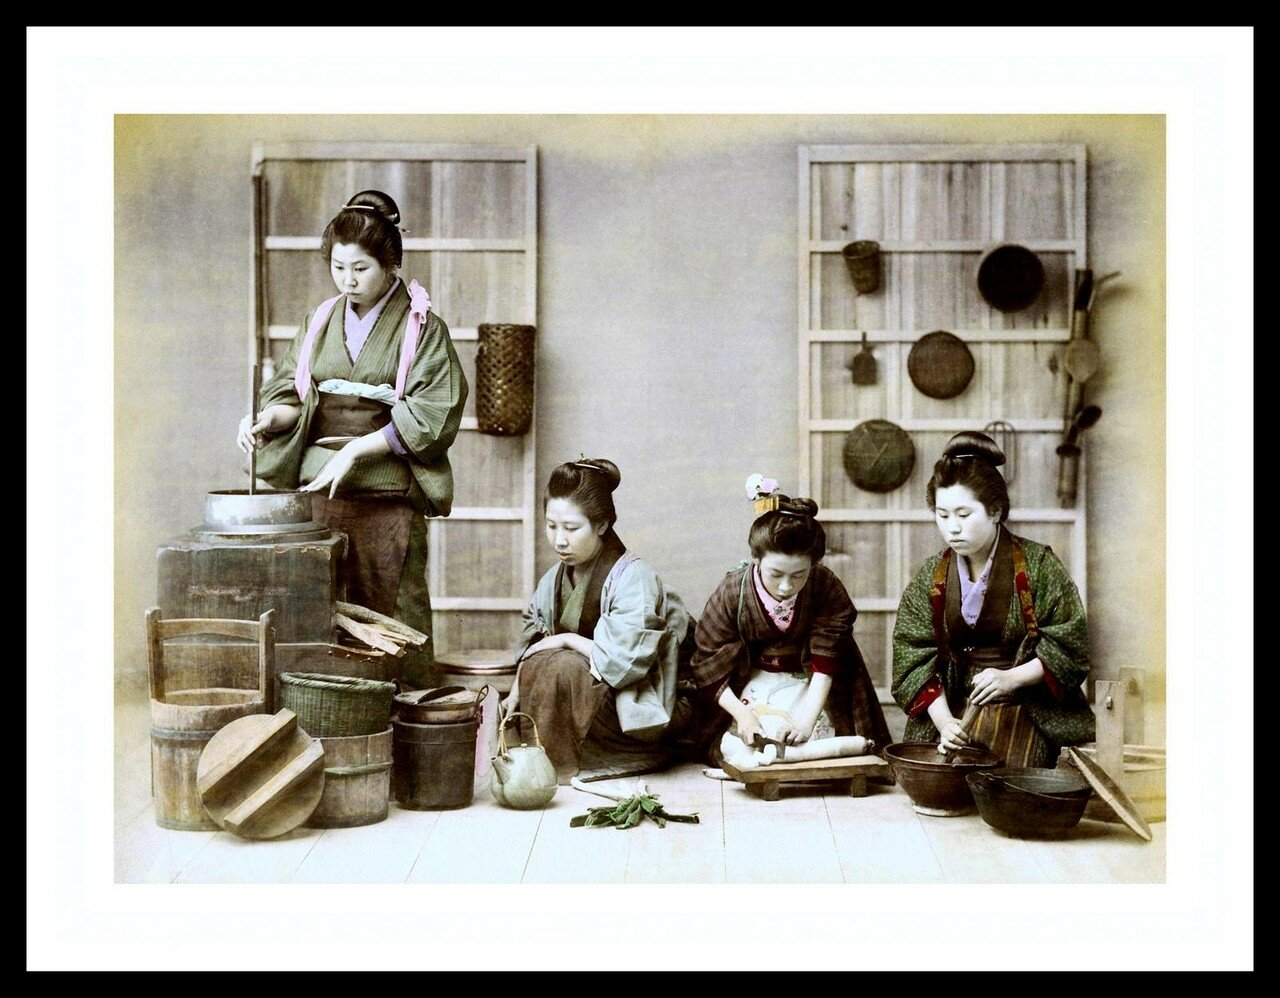 Четыре девушки готовят обед